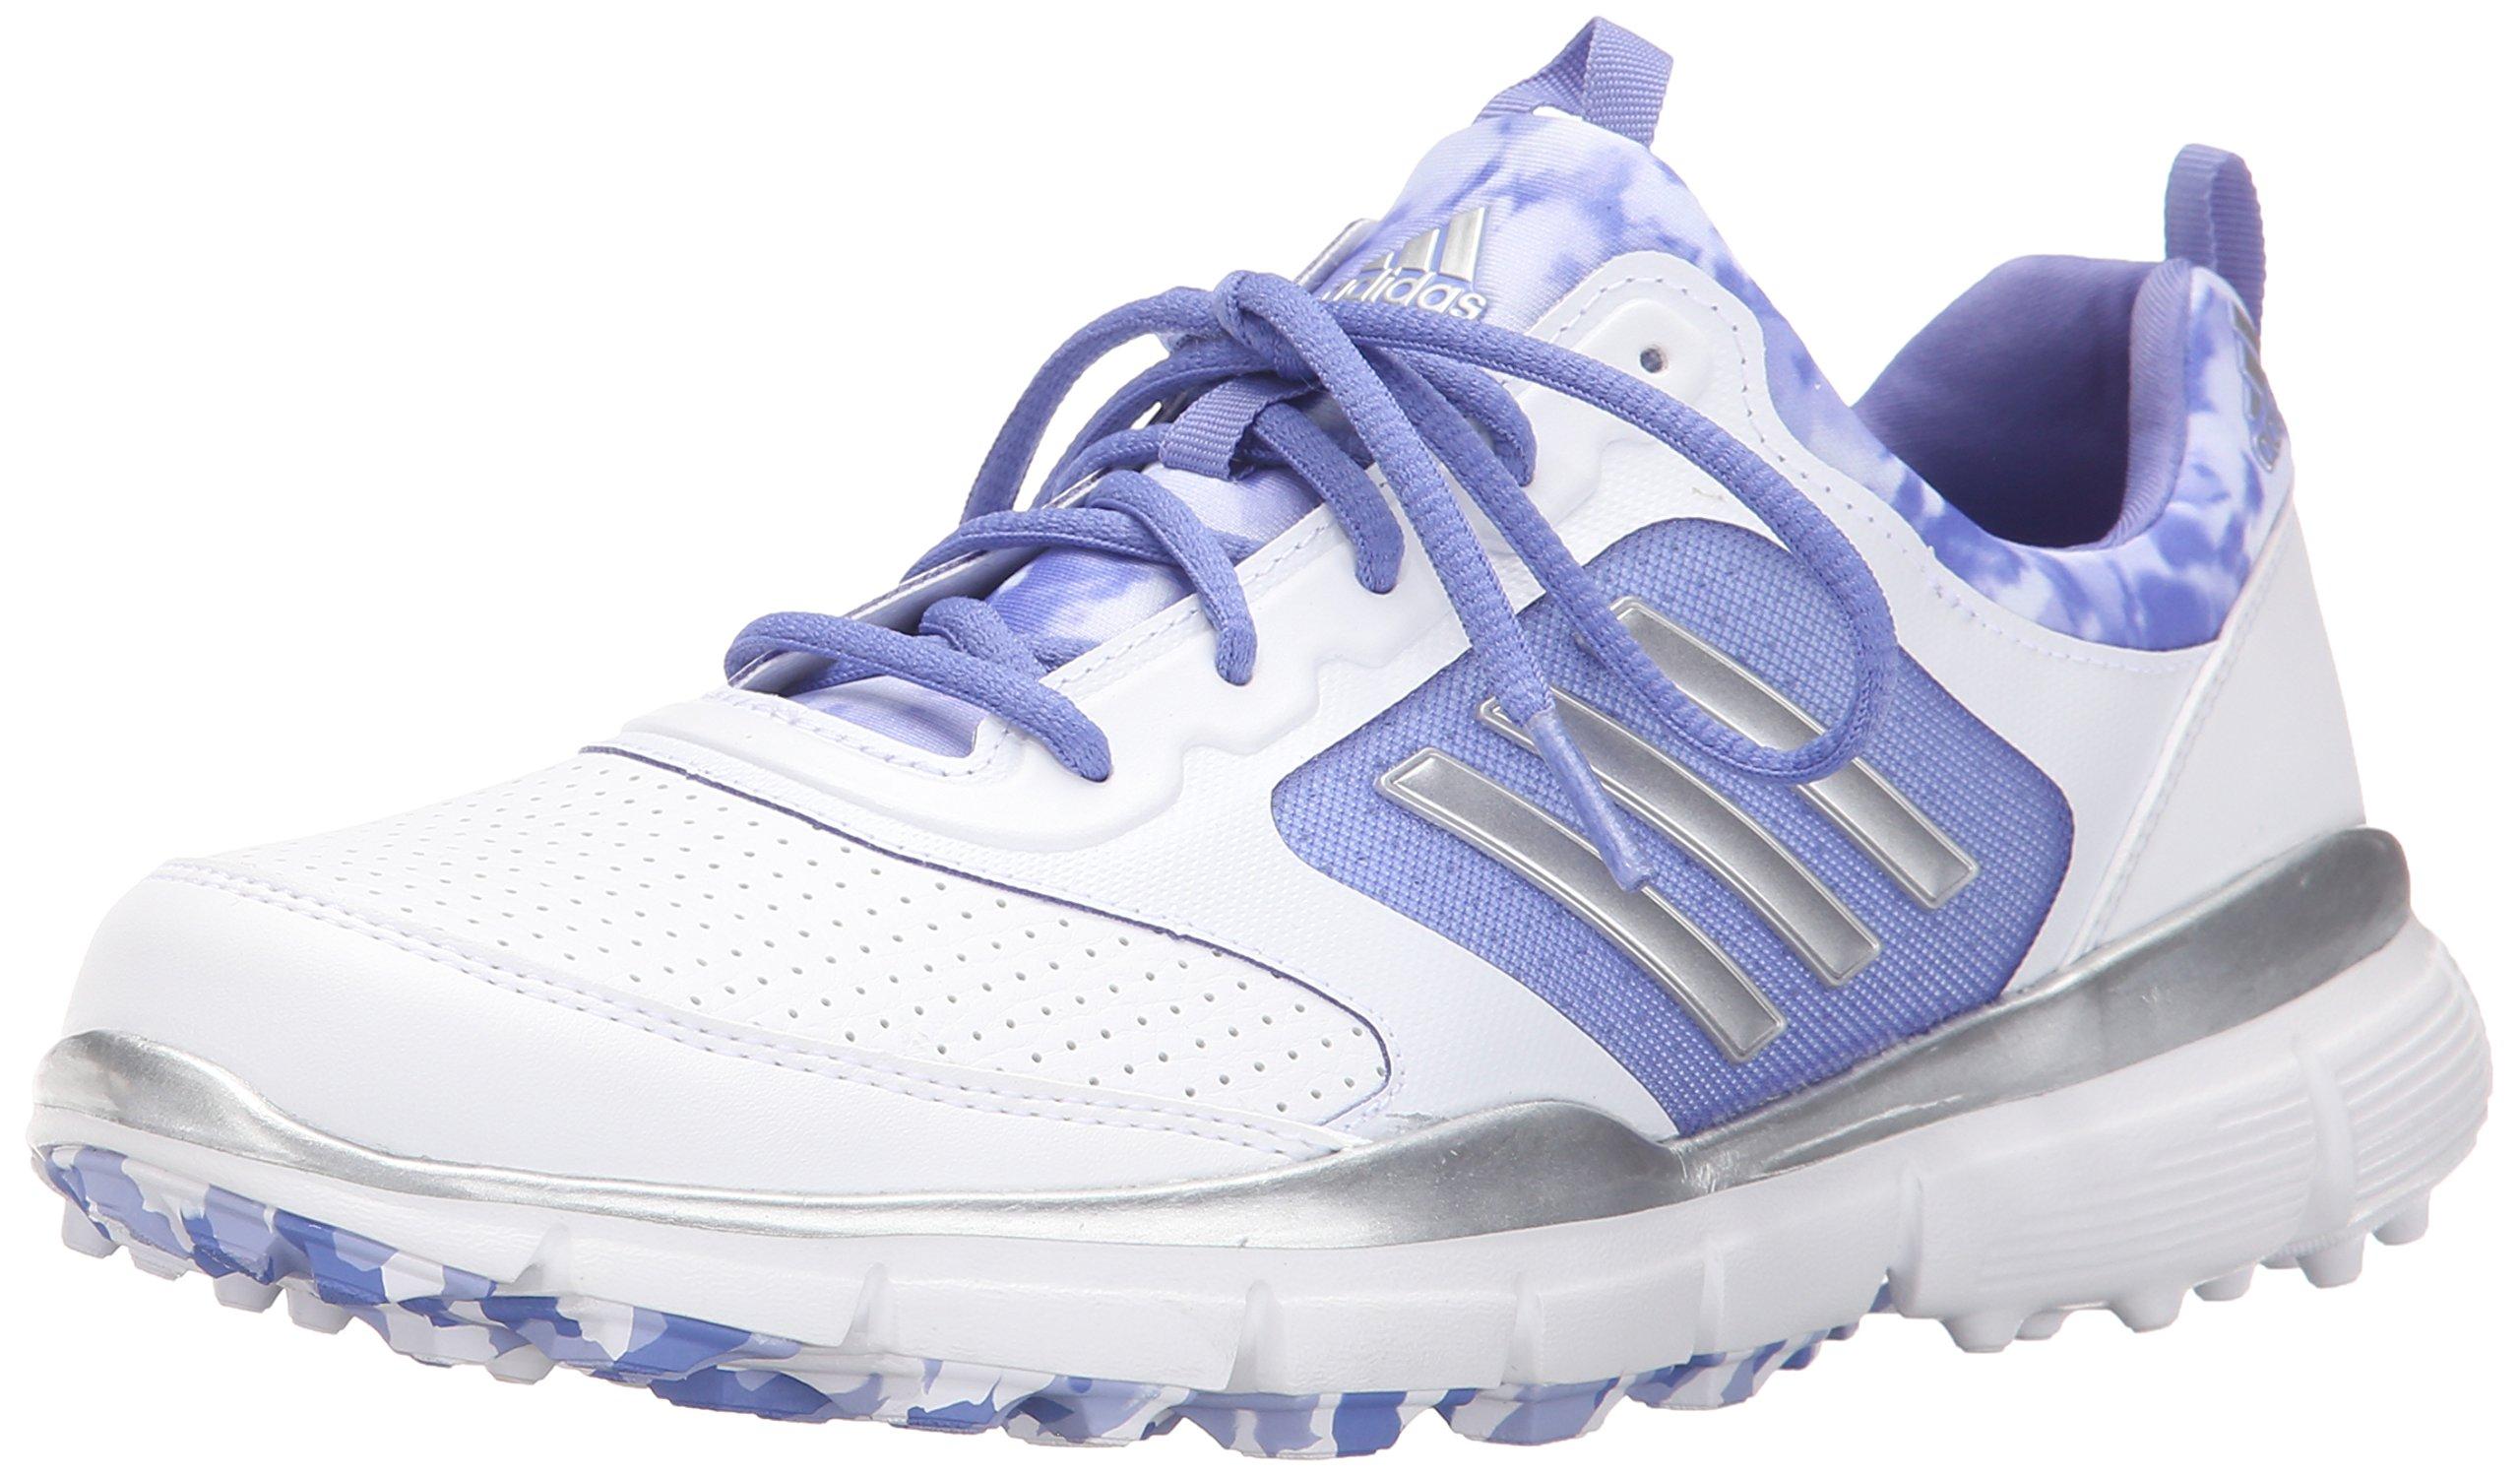 adidas Women's W Adistar Sport Golf Spikeless, FTWR White/Silver Metallic/Baja Blue-TMAG, 7 M US